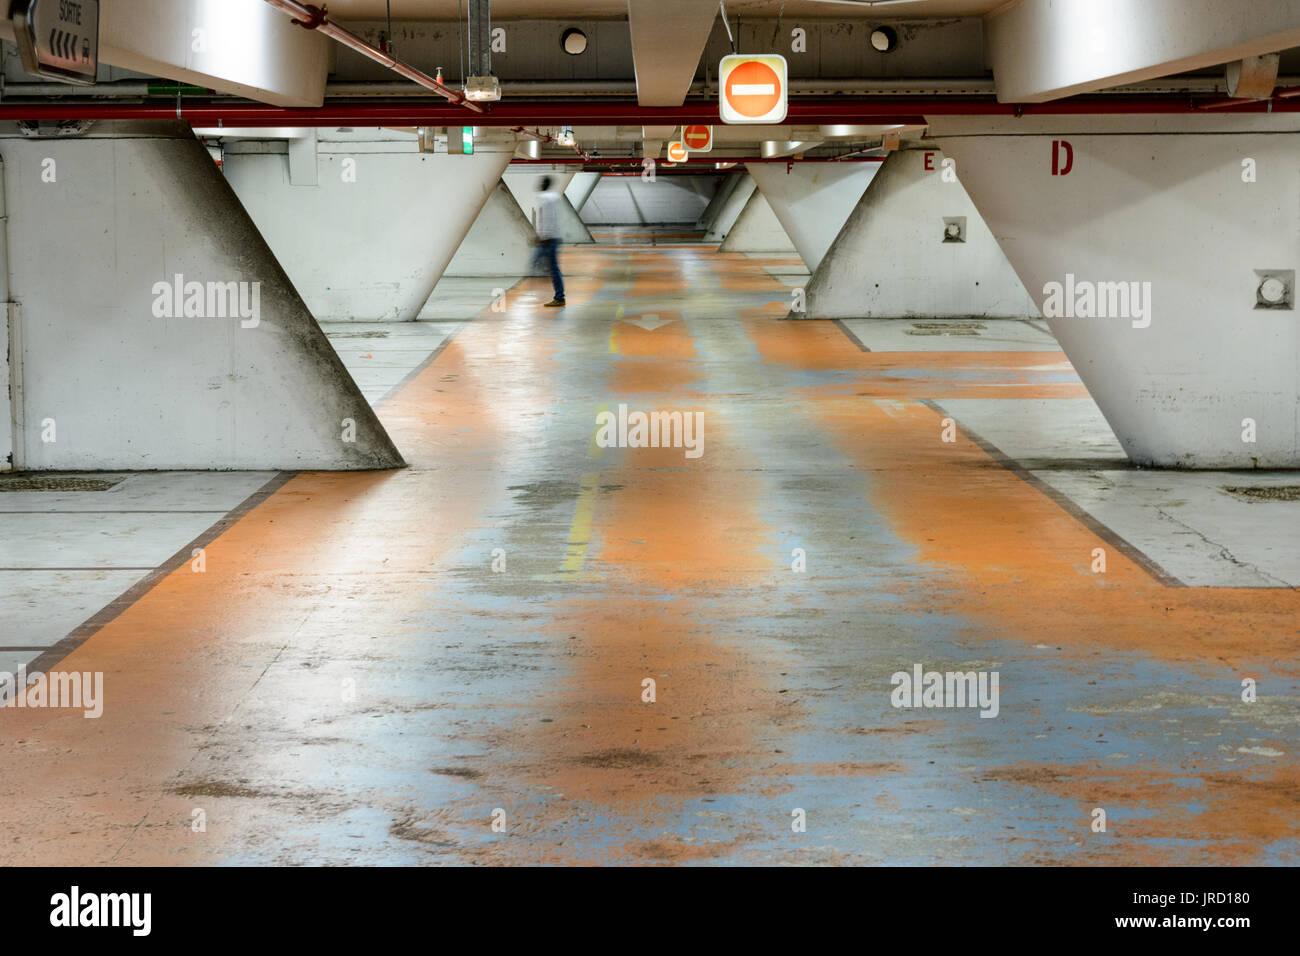 Old decrepit underground parking lot. Stock Photo